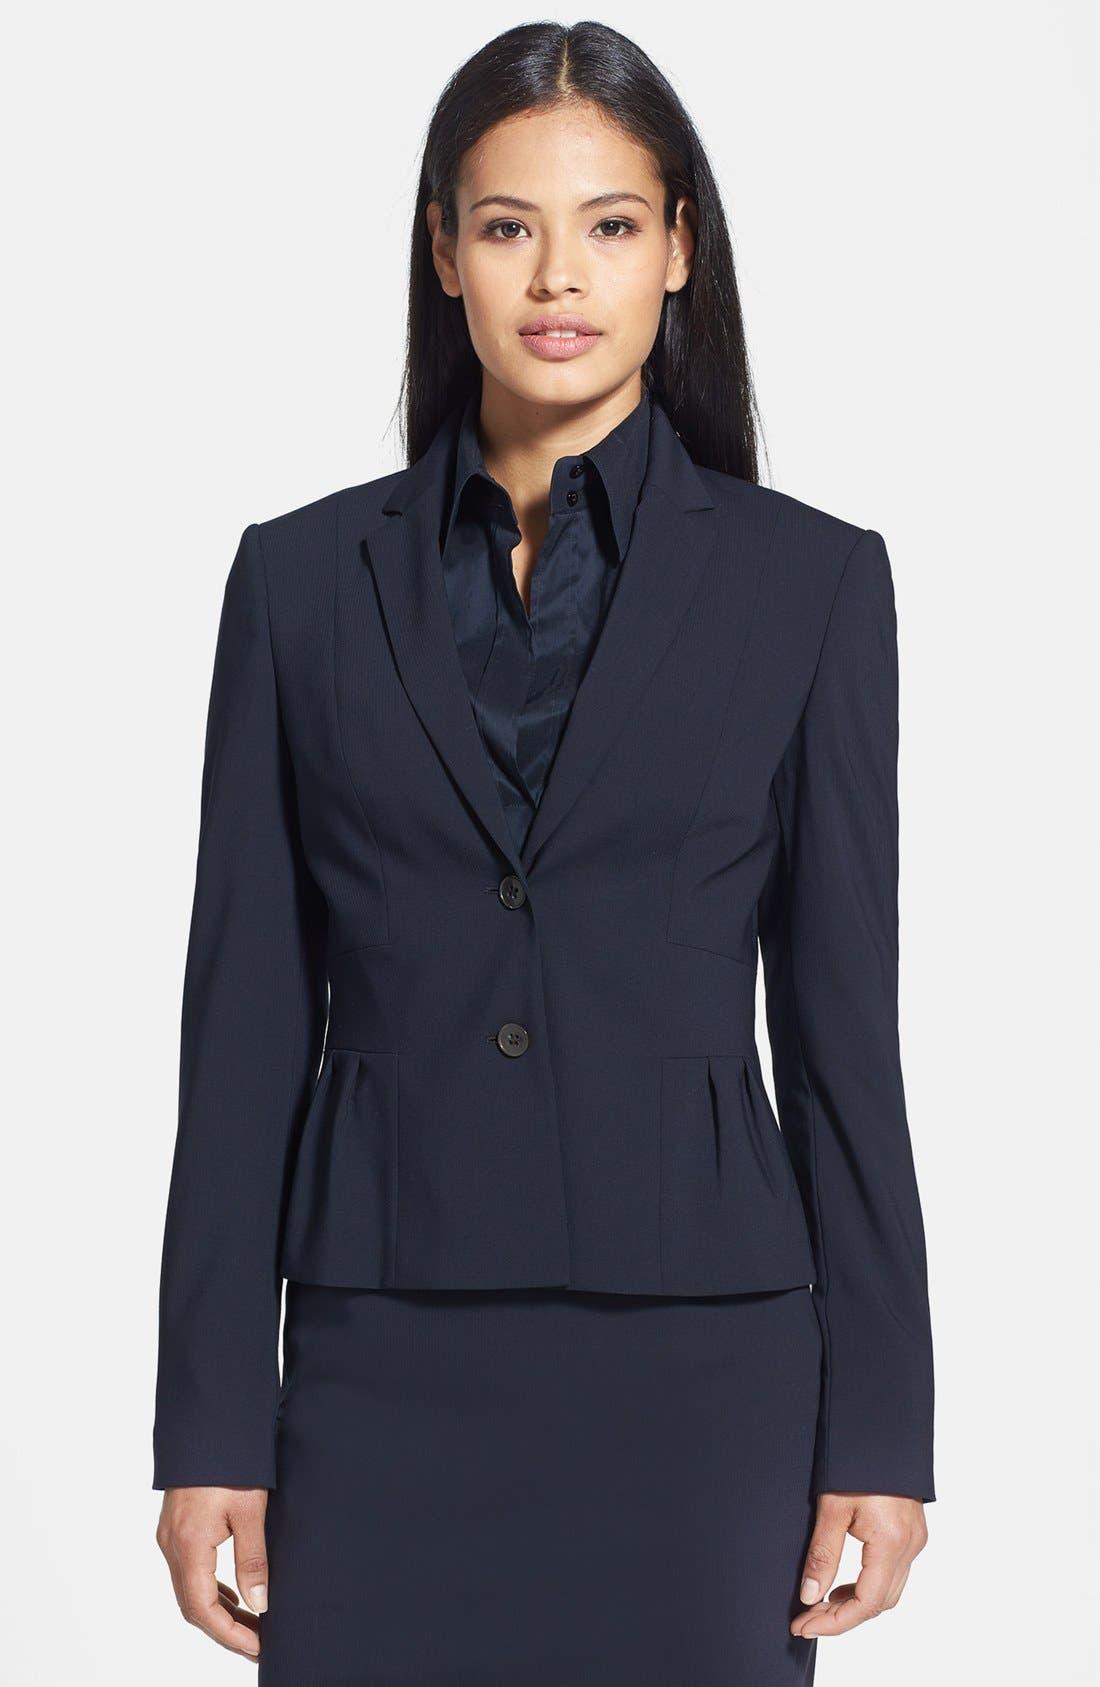 Alternate Image 1 Selected - BOSS 'Jorila' Stretch Wool Jacket